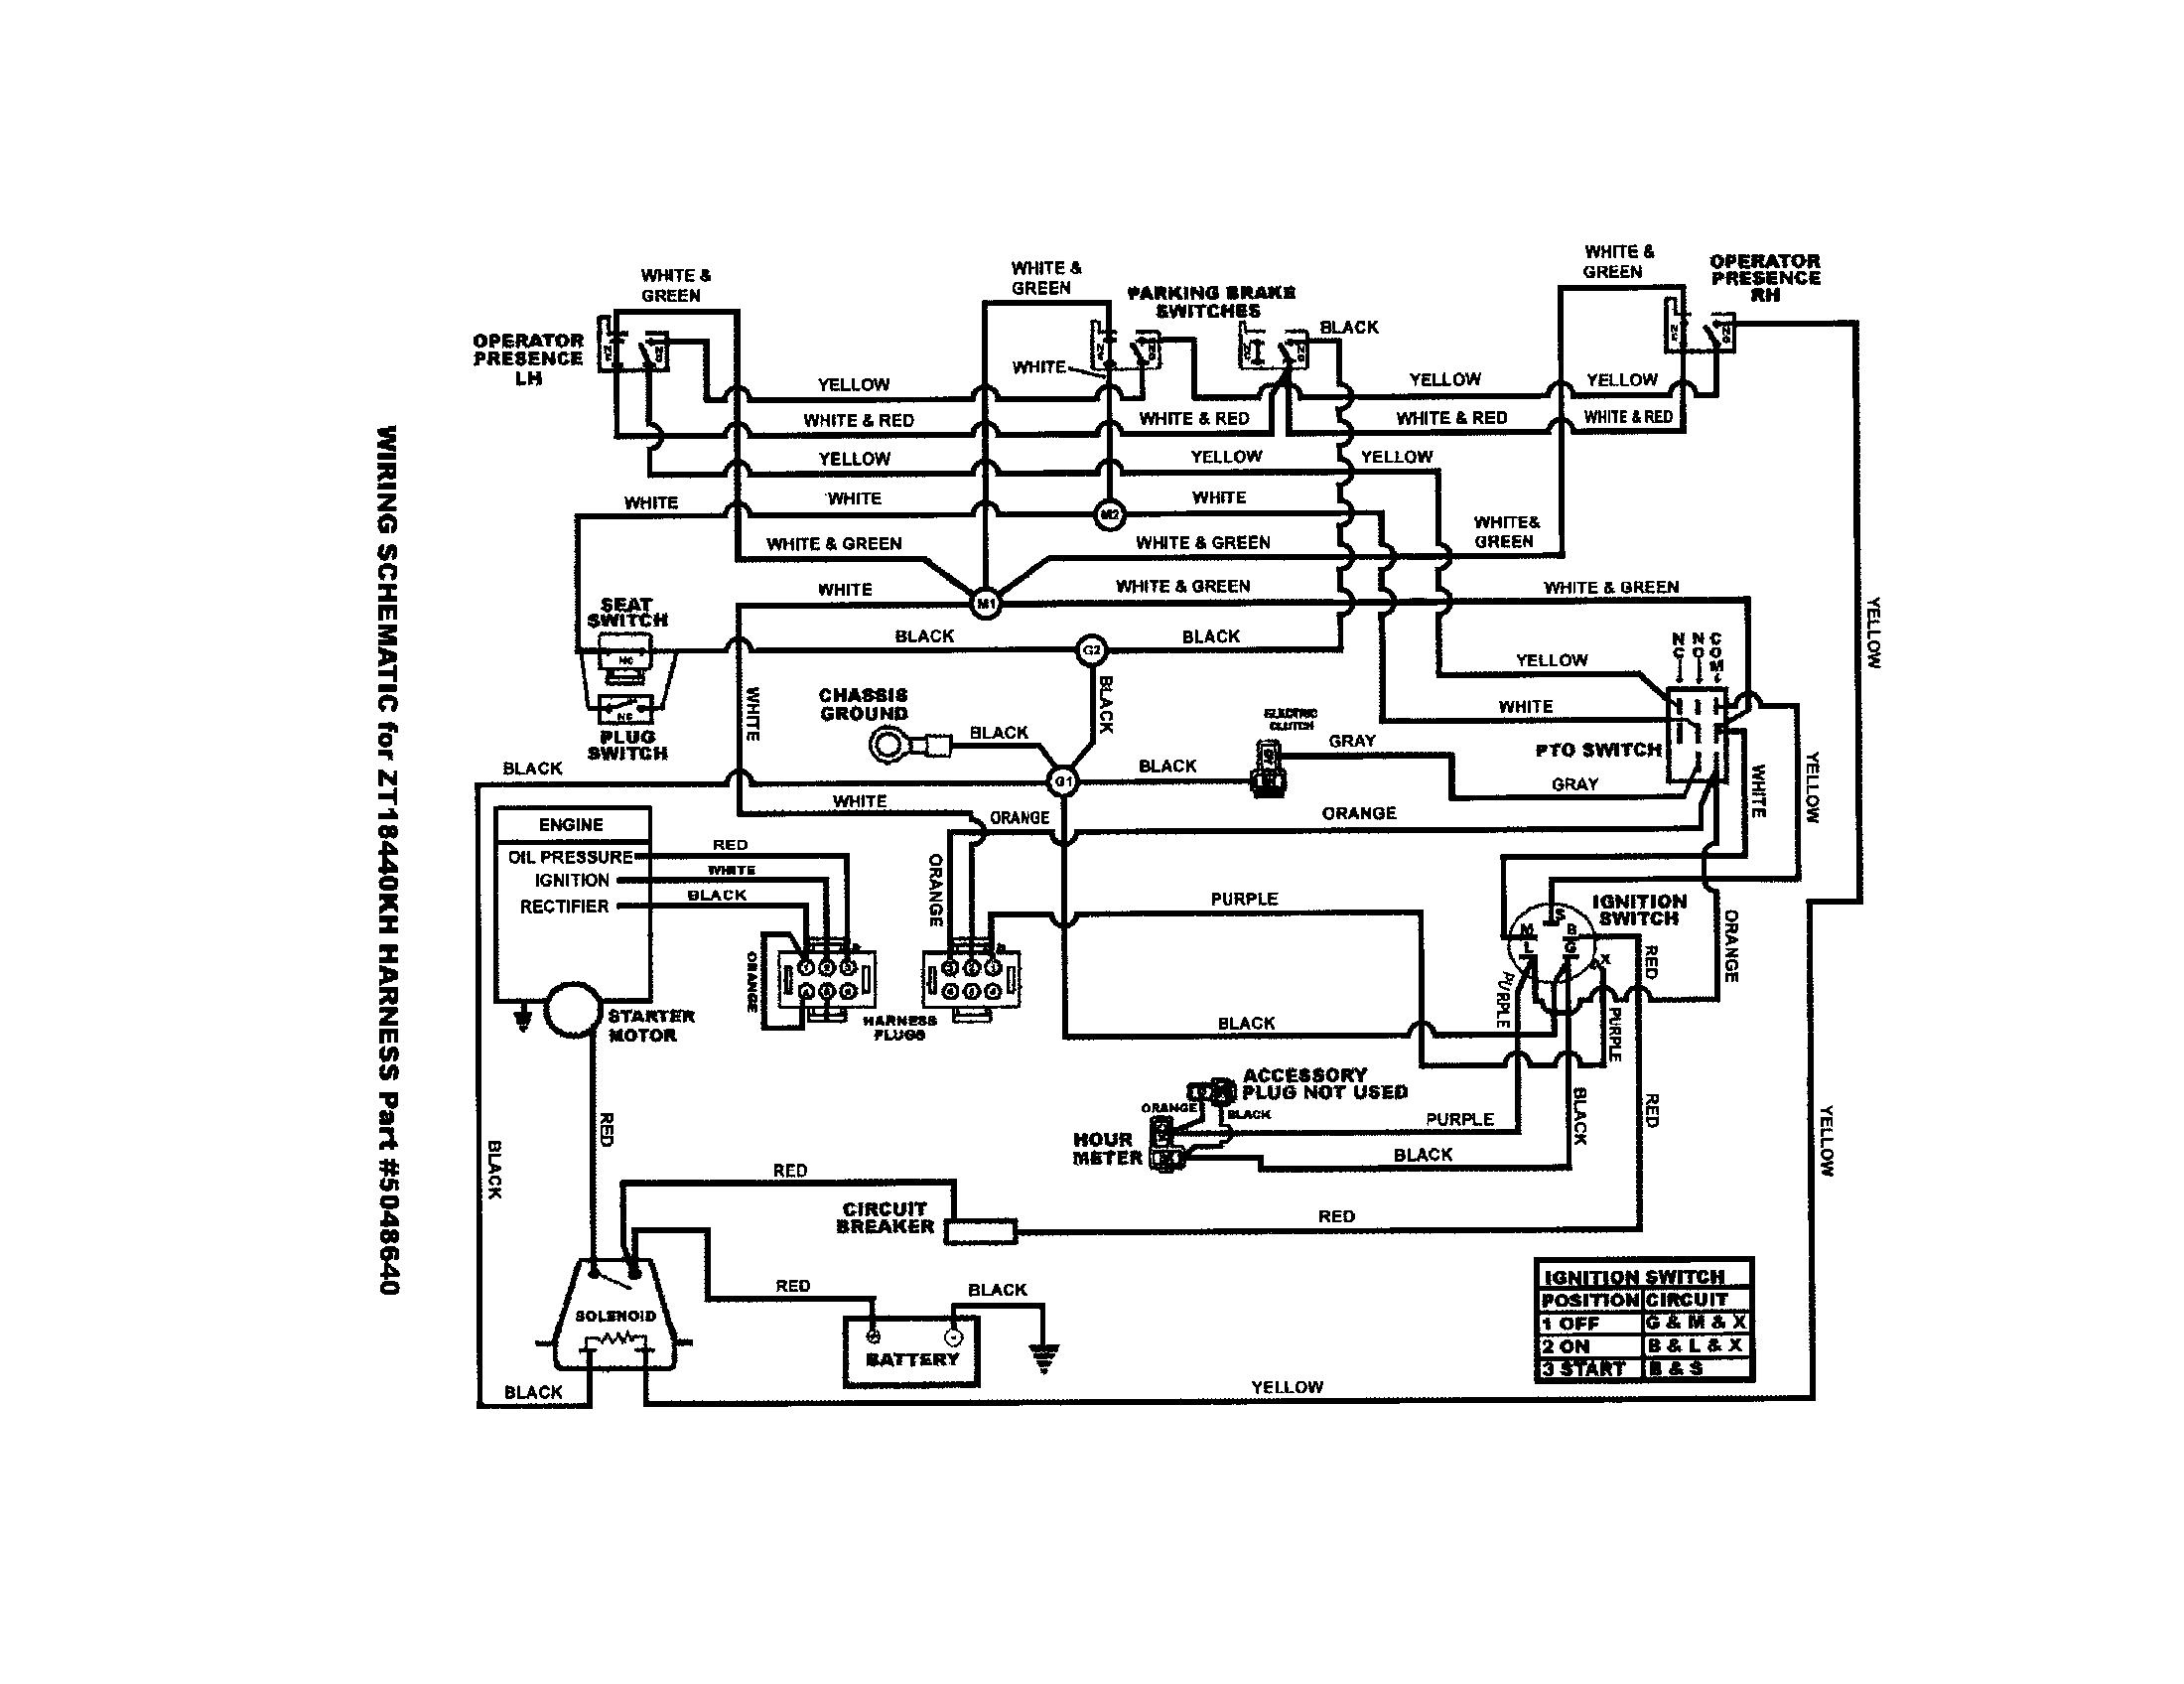 simplicity broadmoor  1693694 electrical wiring diagram